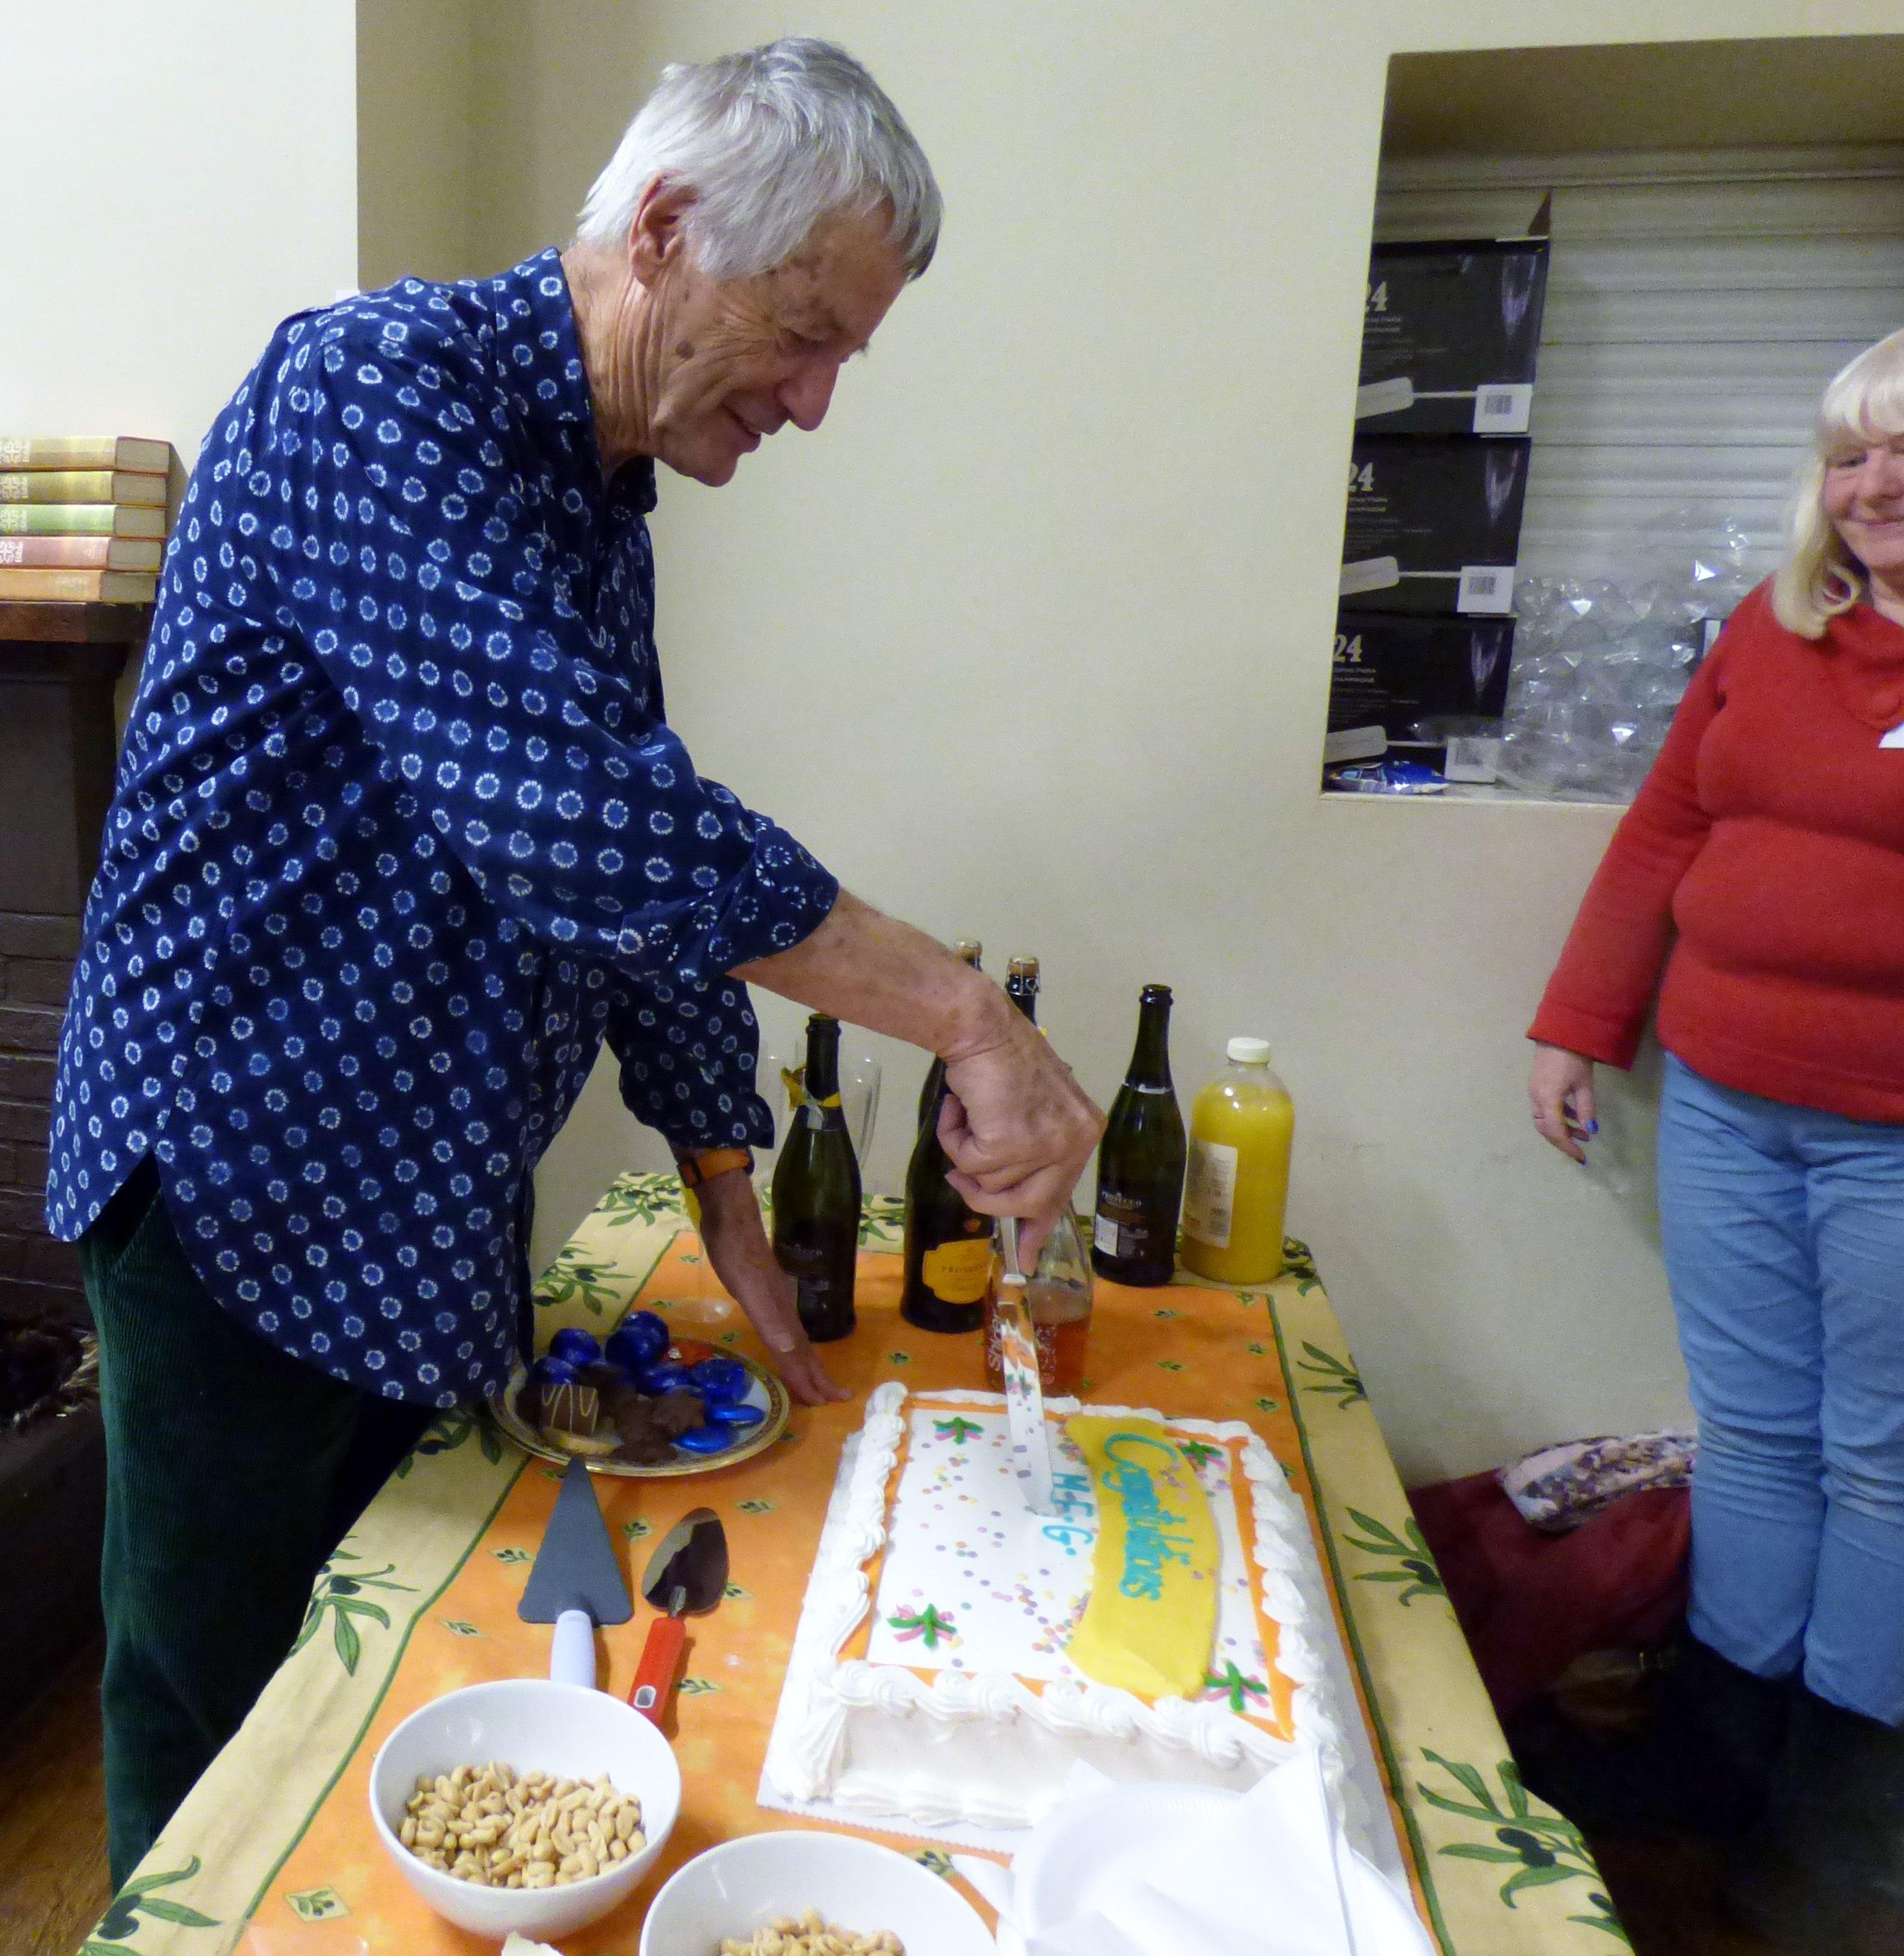 Kaffe cut our 60th Anniversary celebration cake at Kaffe Fassett workshop, All Hallows, Dec 2016